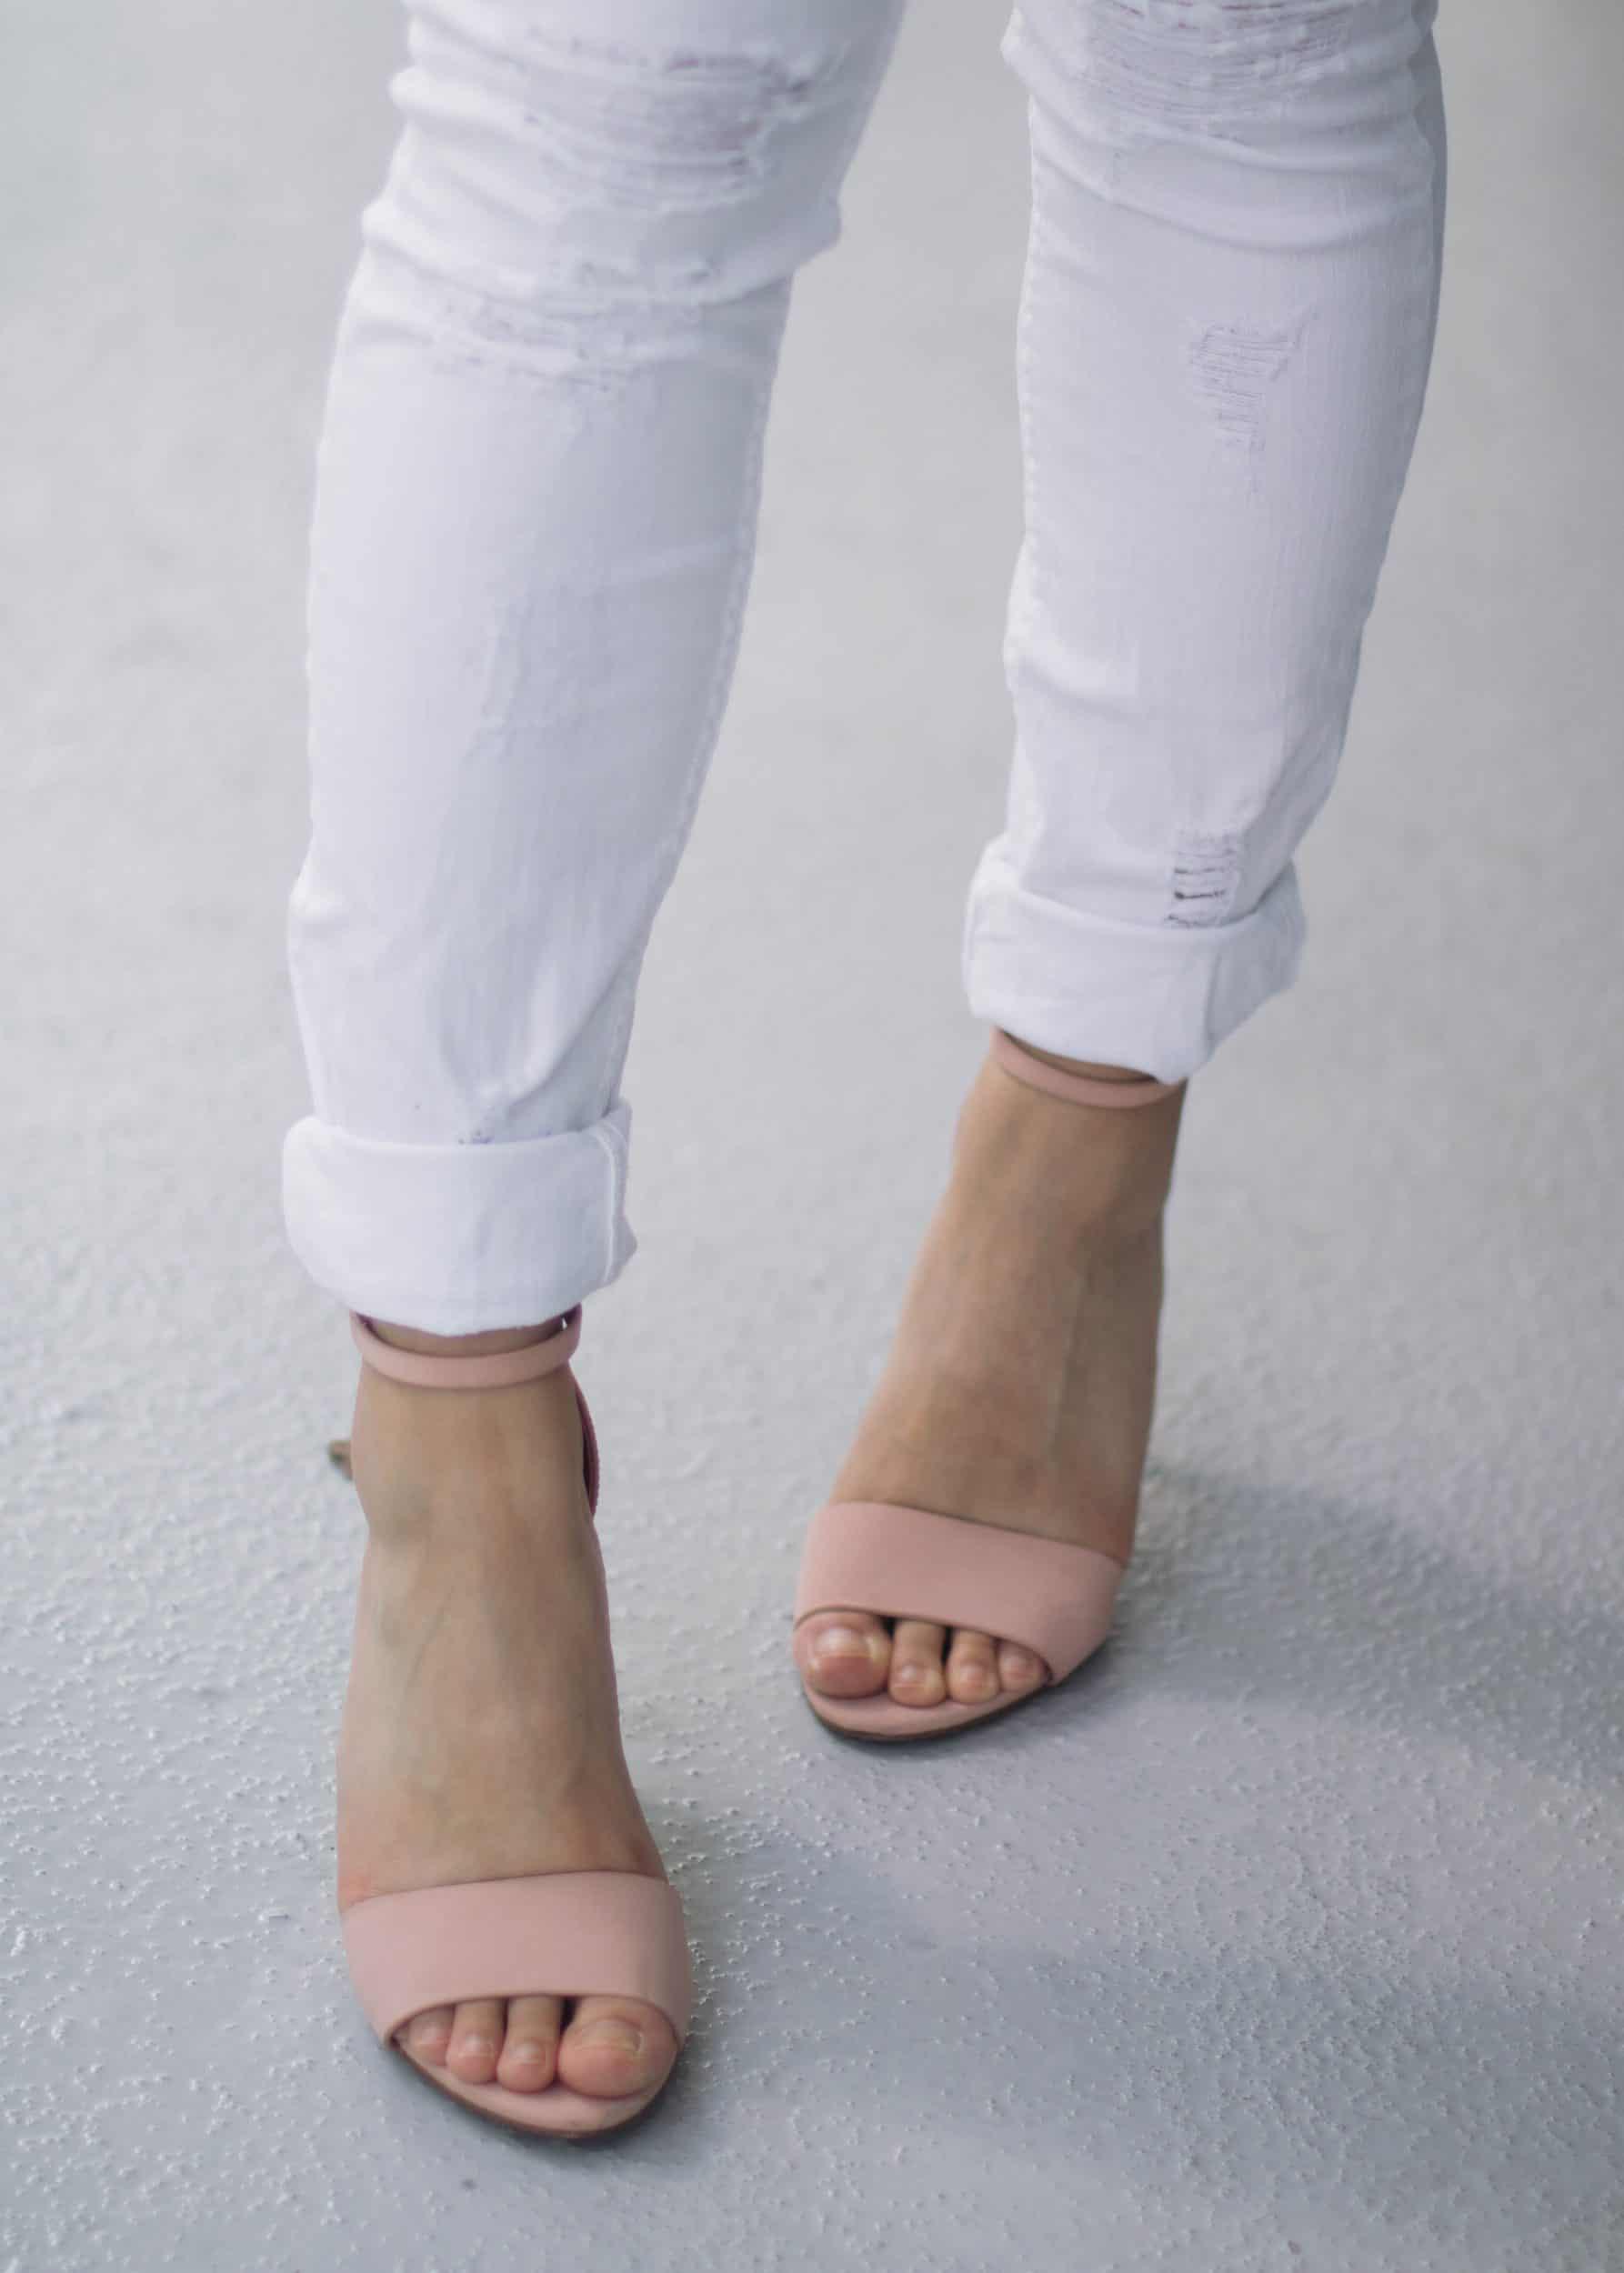 7 Best Canadian Shoe Brands to Shop